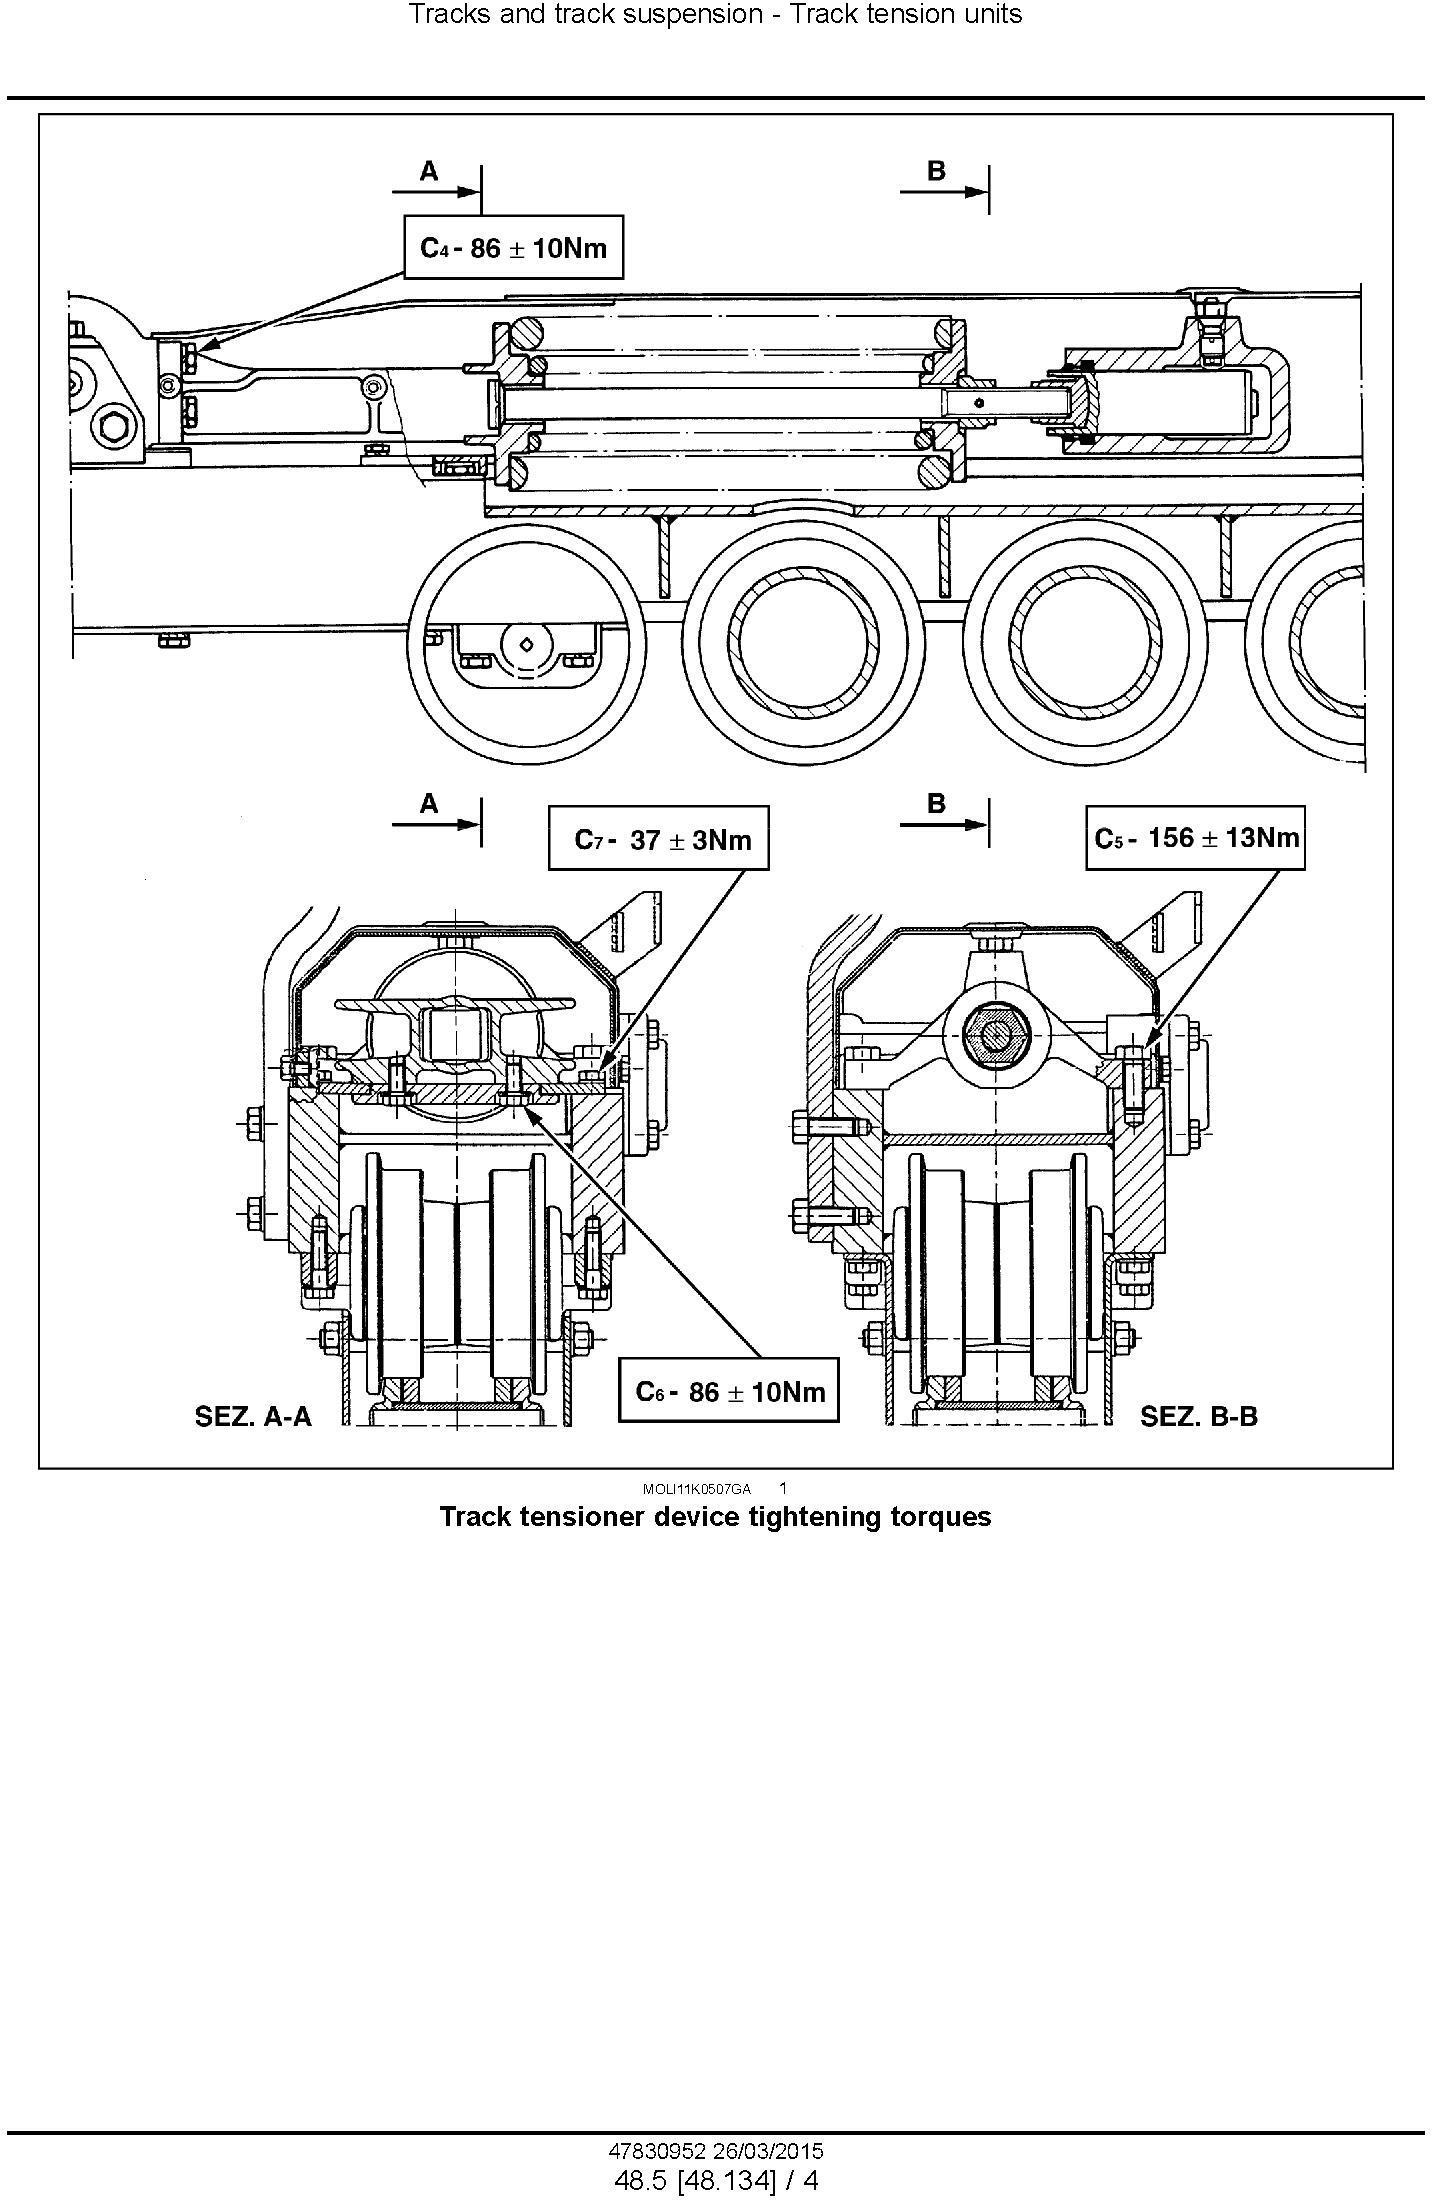 New Holland TK4020 F/V, TK4030 / F/V, TK4040 /M, TK4050 /M, TK4060 Crawler Tractor Service Manual - 3